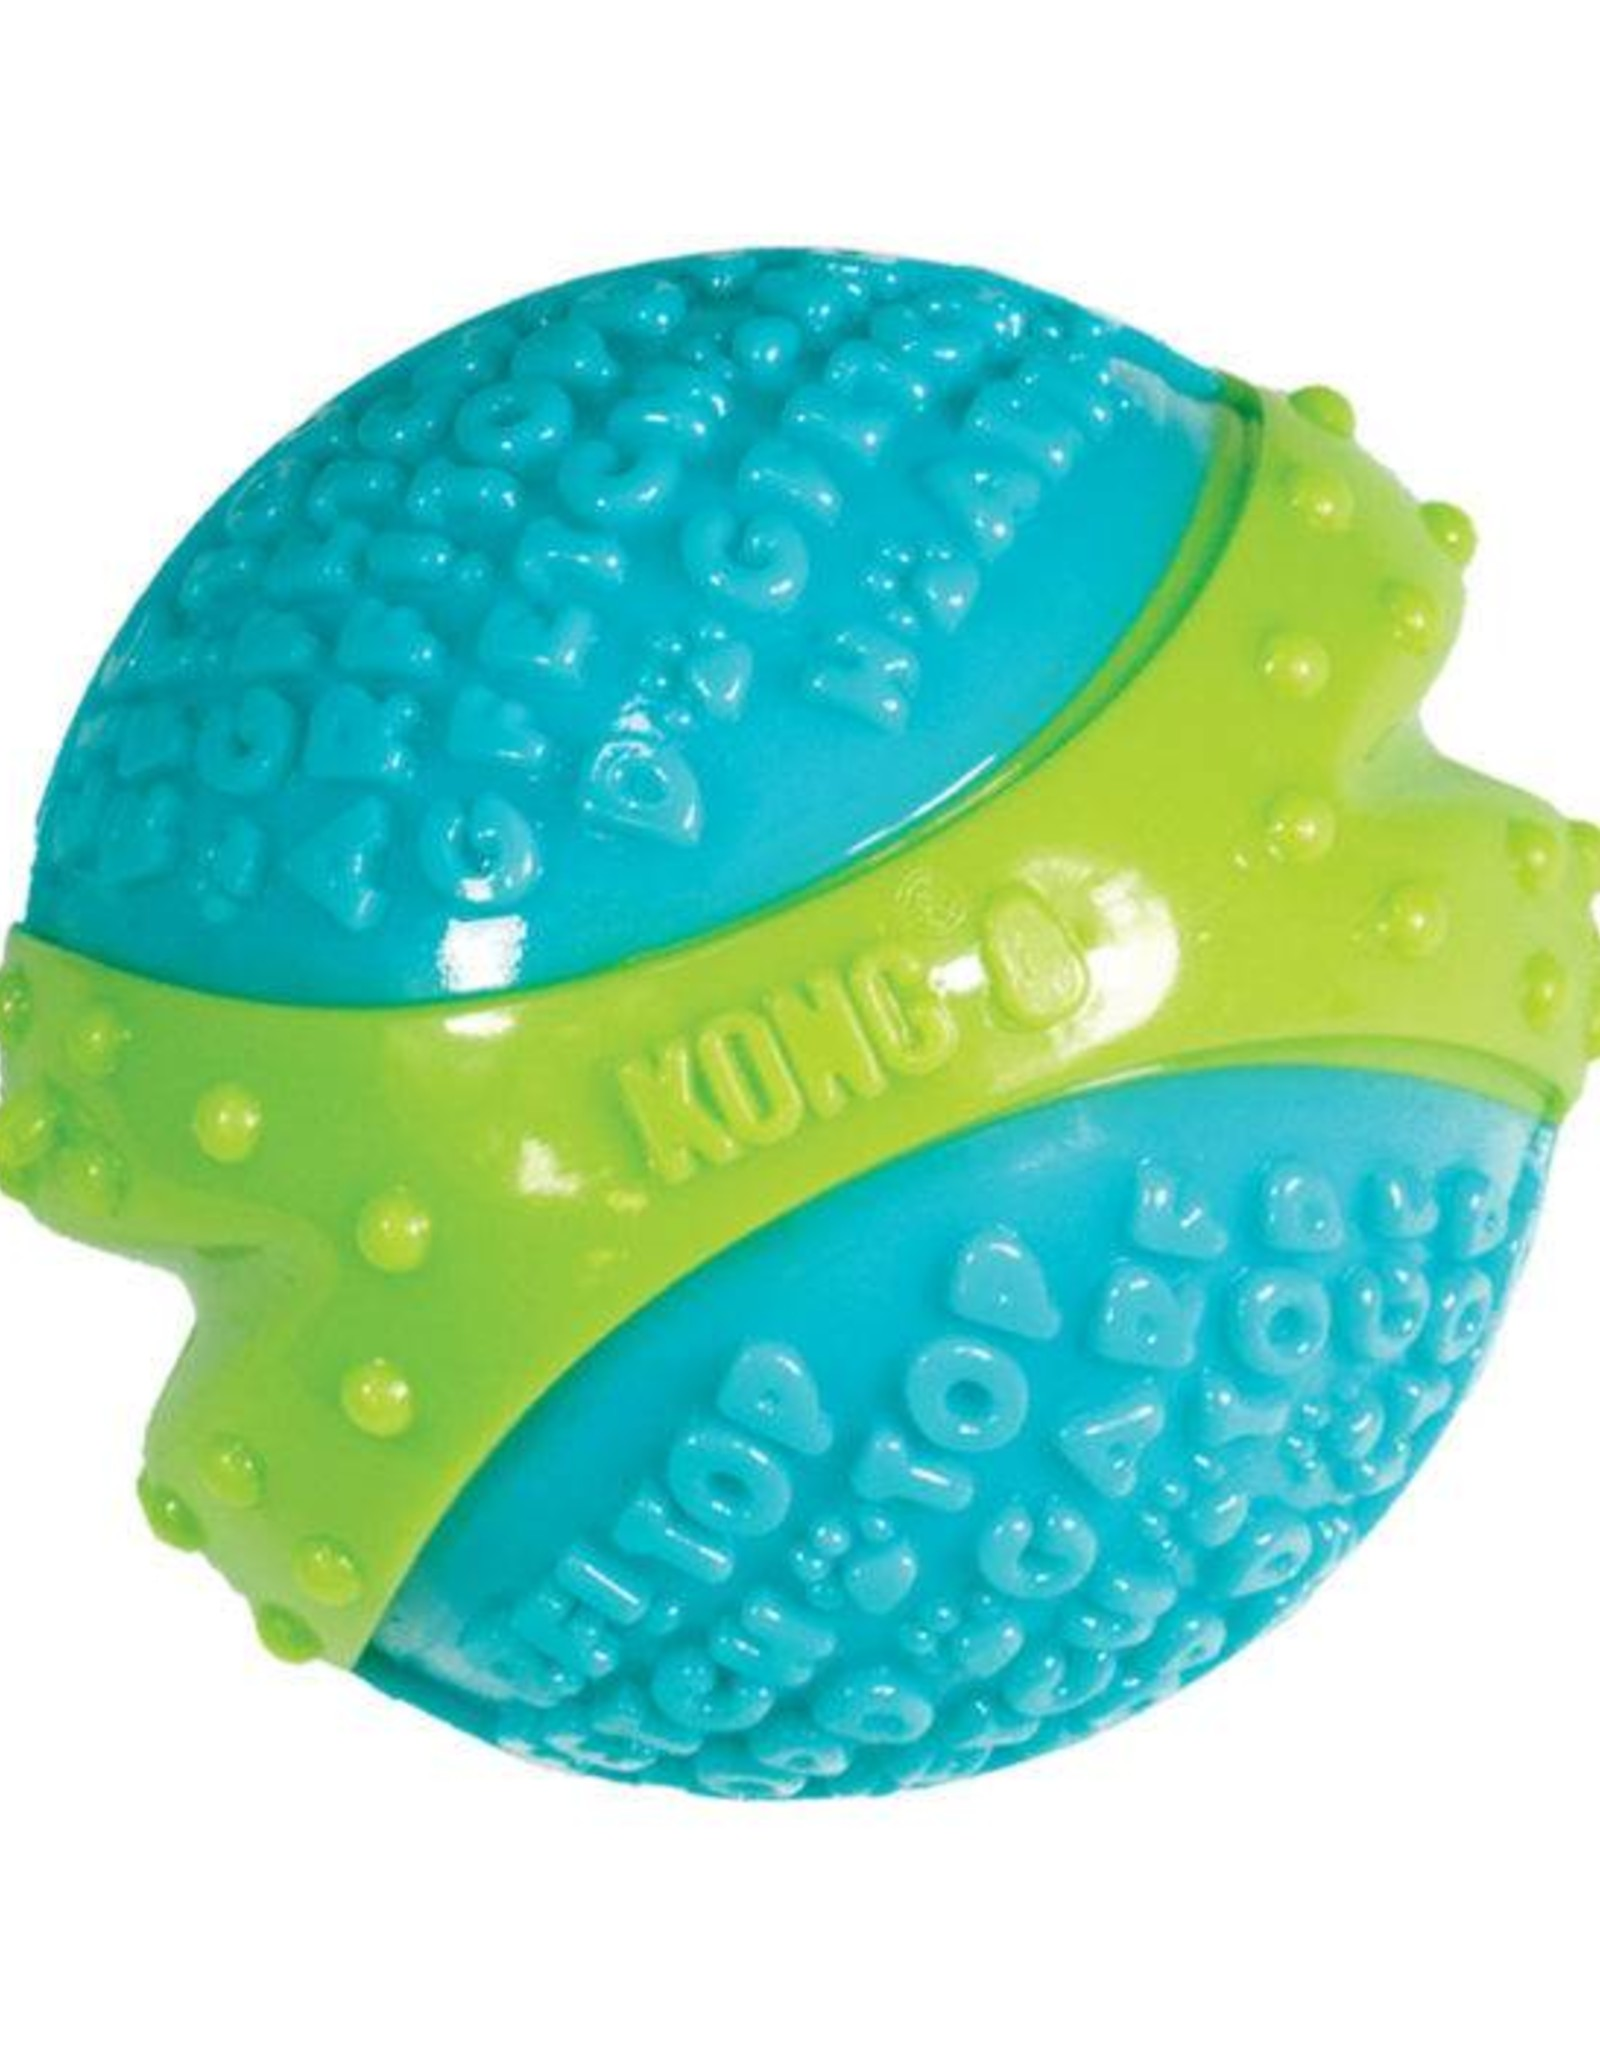 KONG CoreStrength Ball Dog Chew Toy